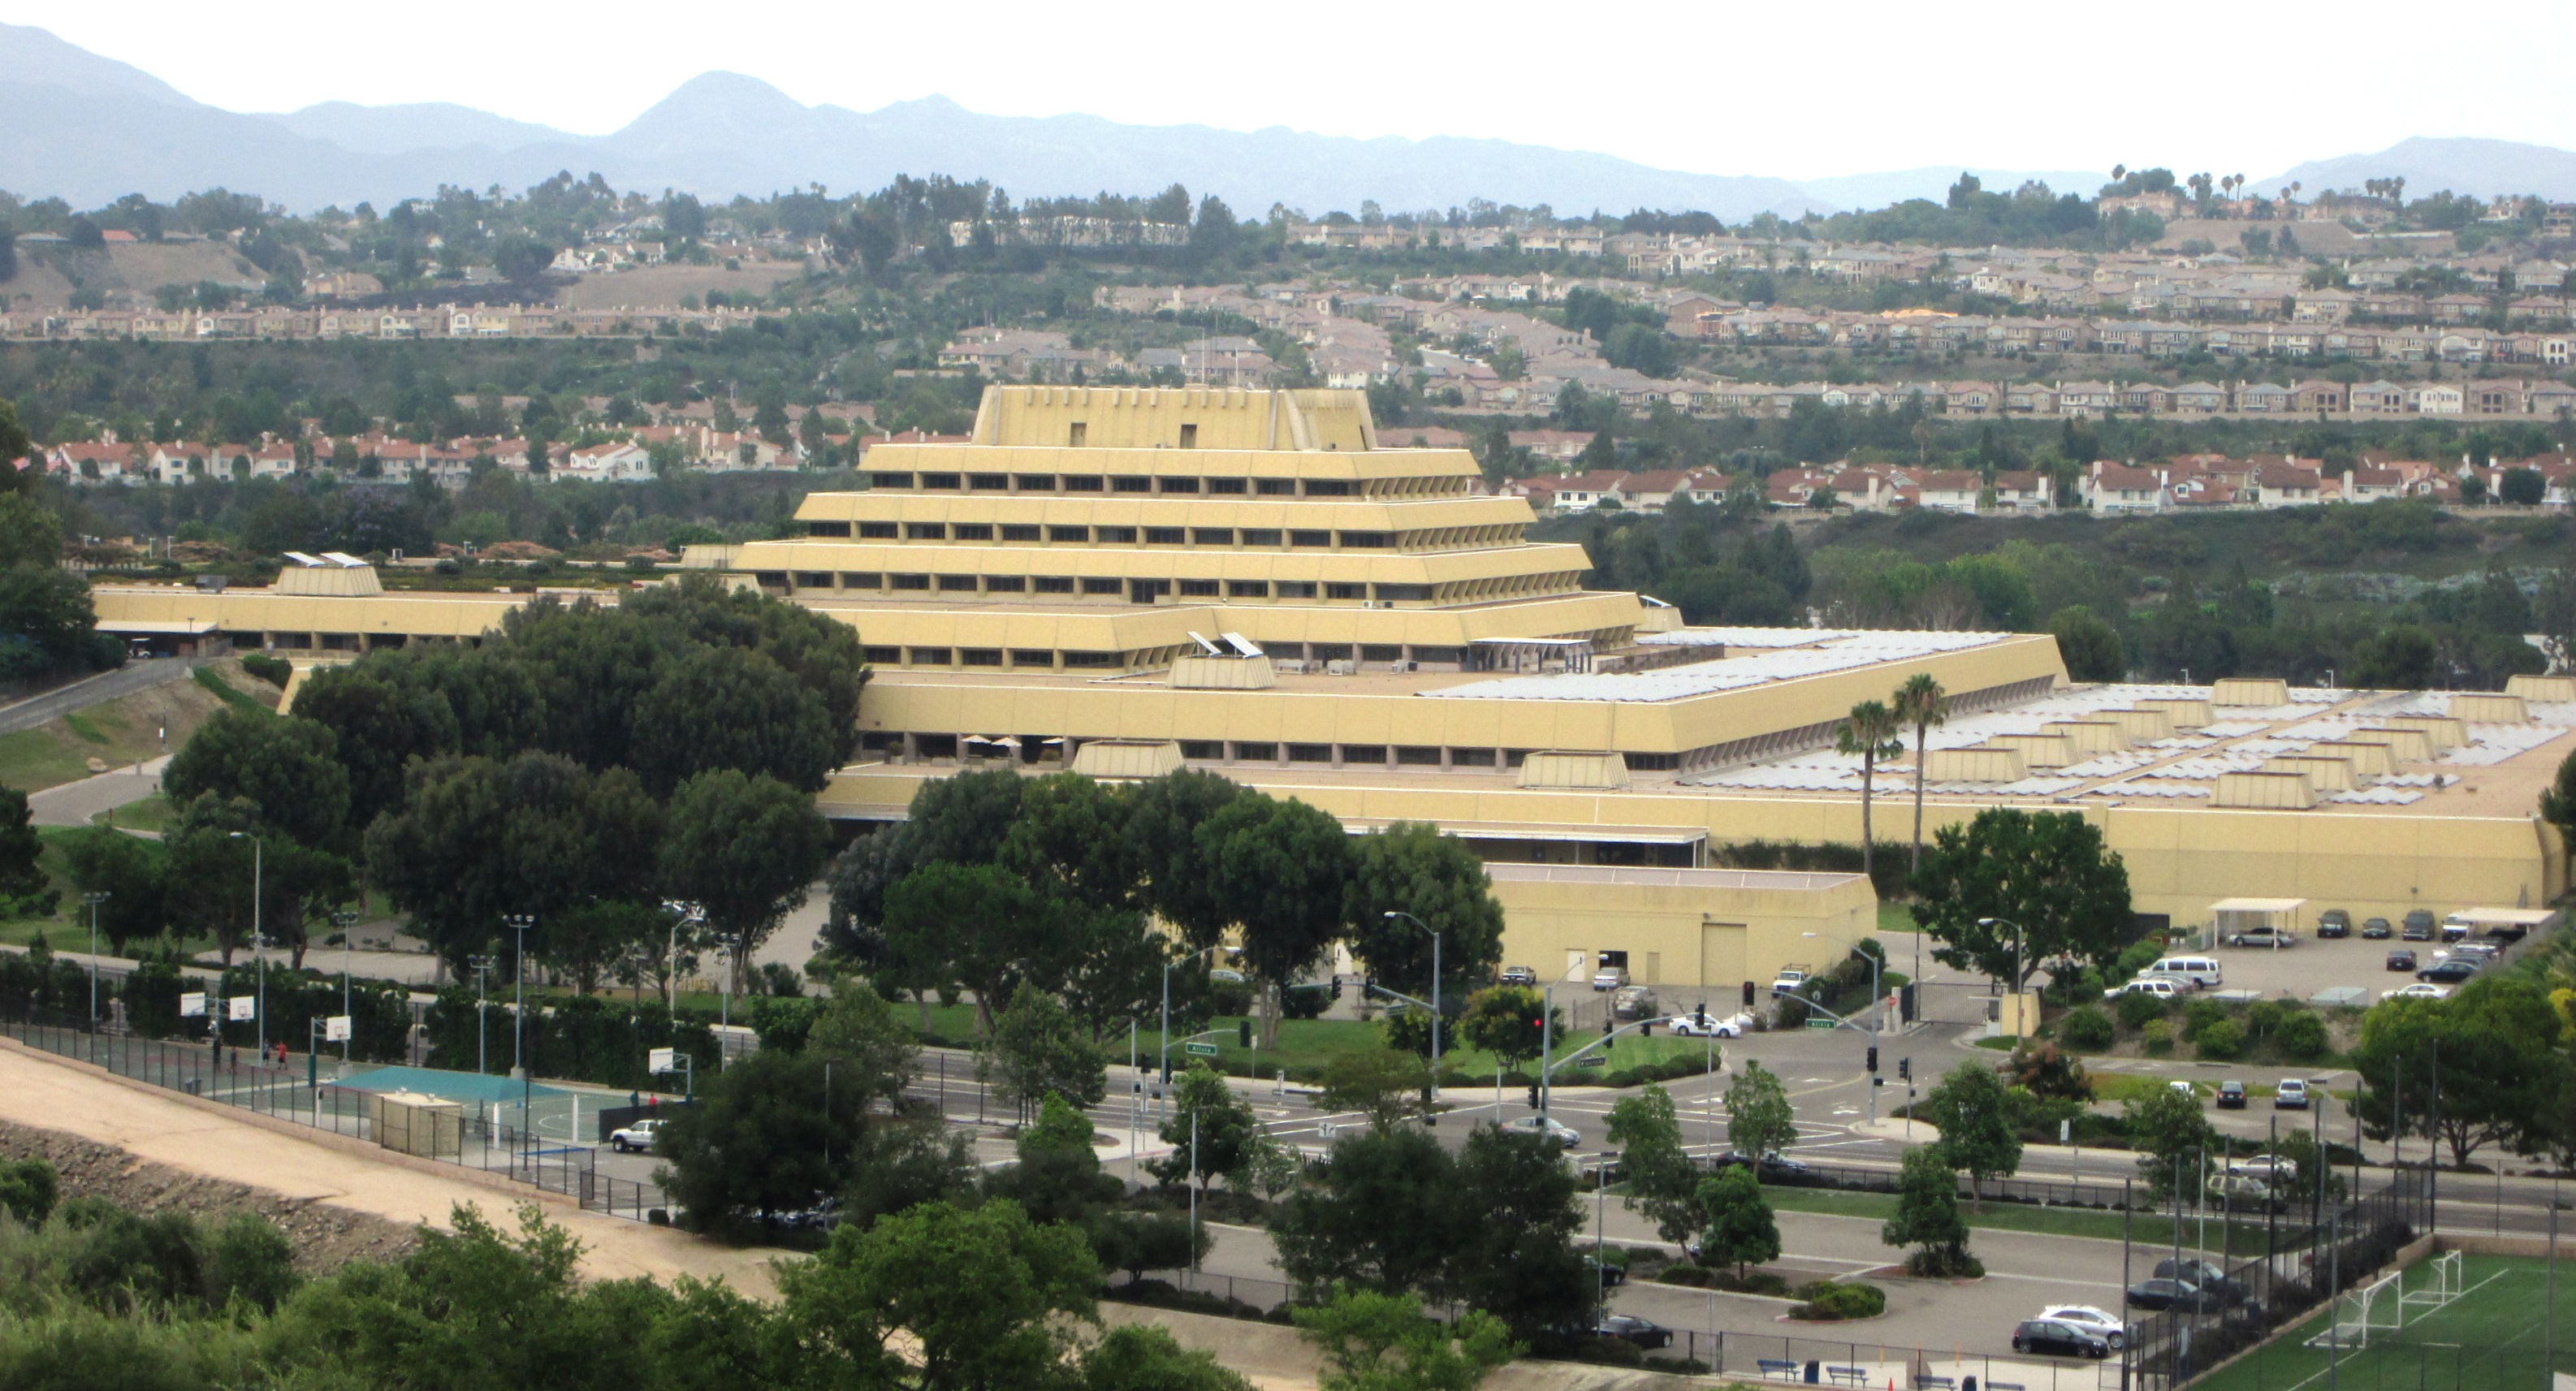 Chet Holifield Federal Building - Laguna Niguel, California  Ziggurat Laguna Niguel